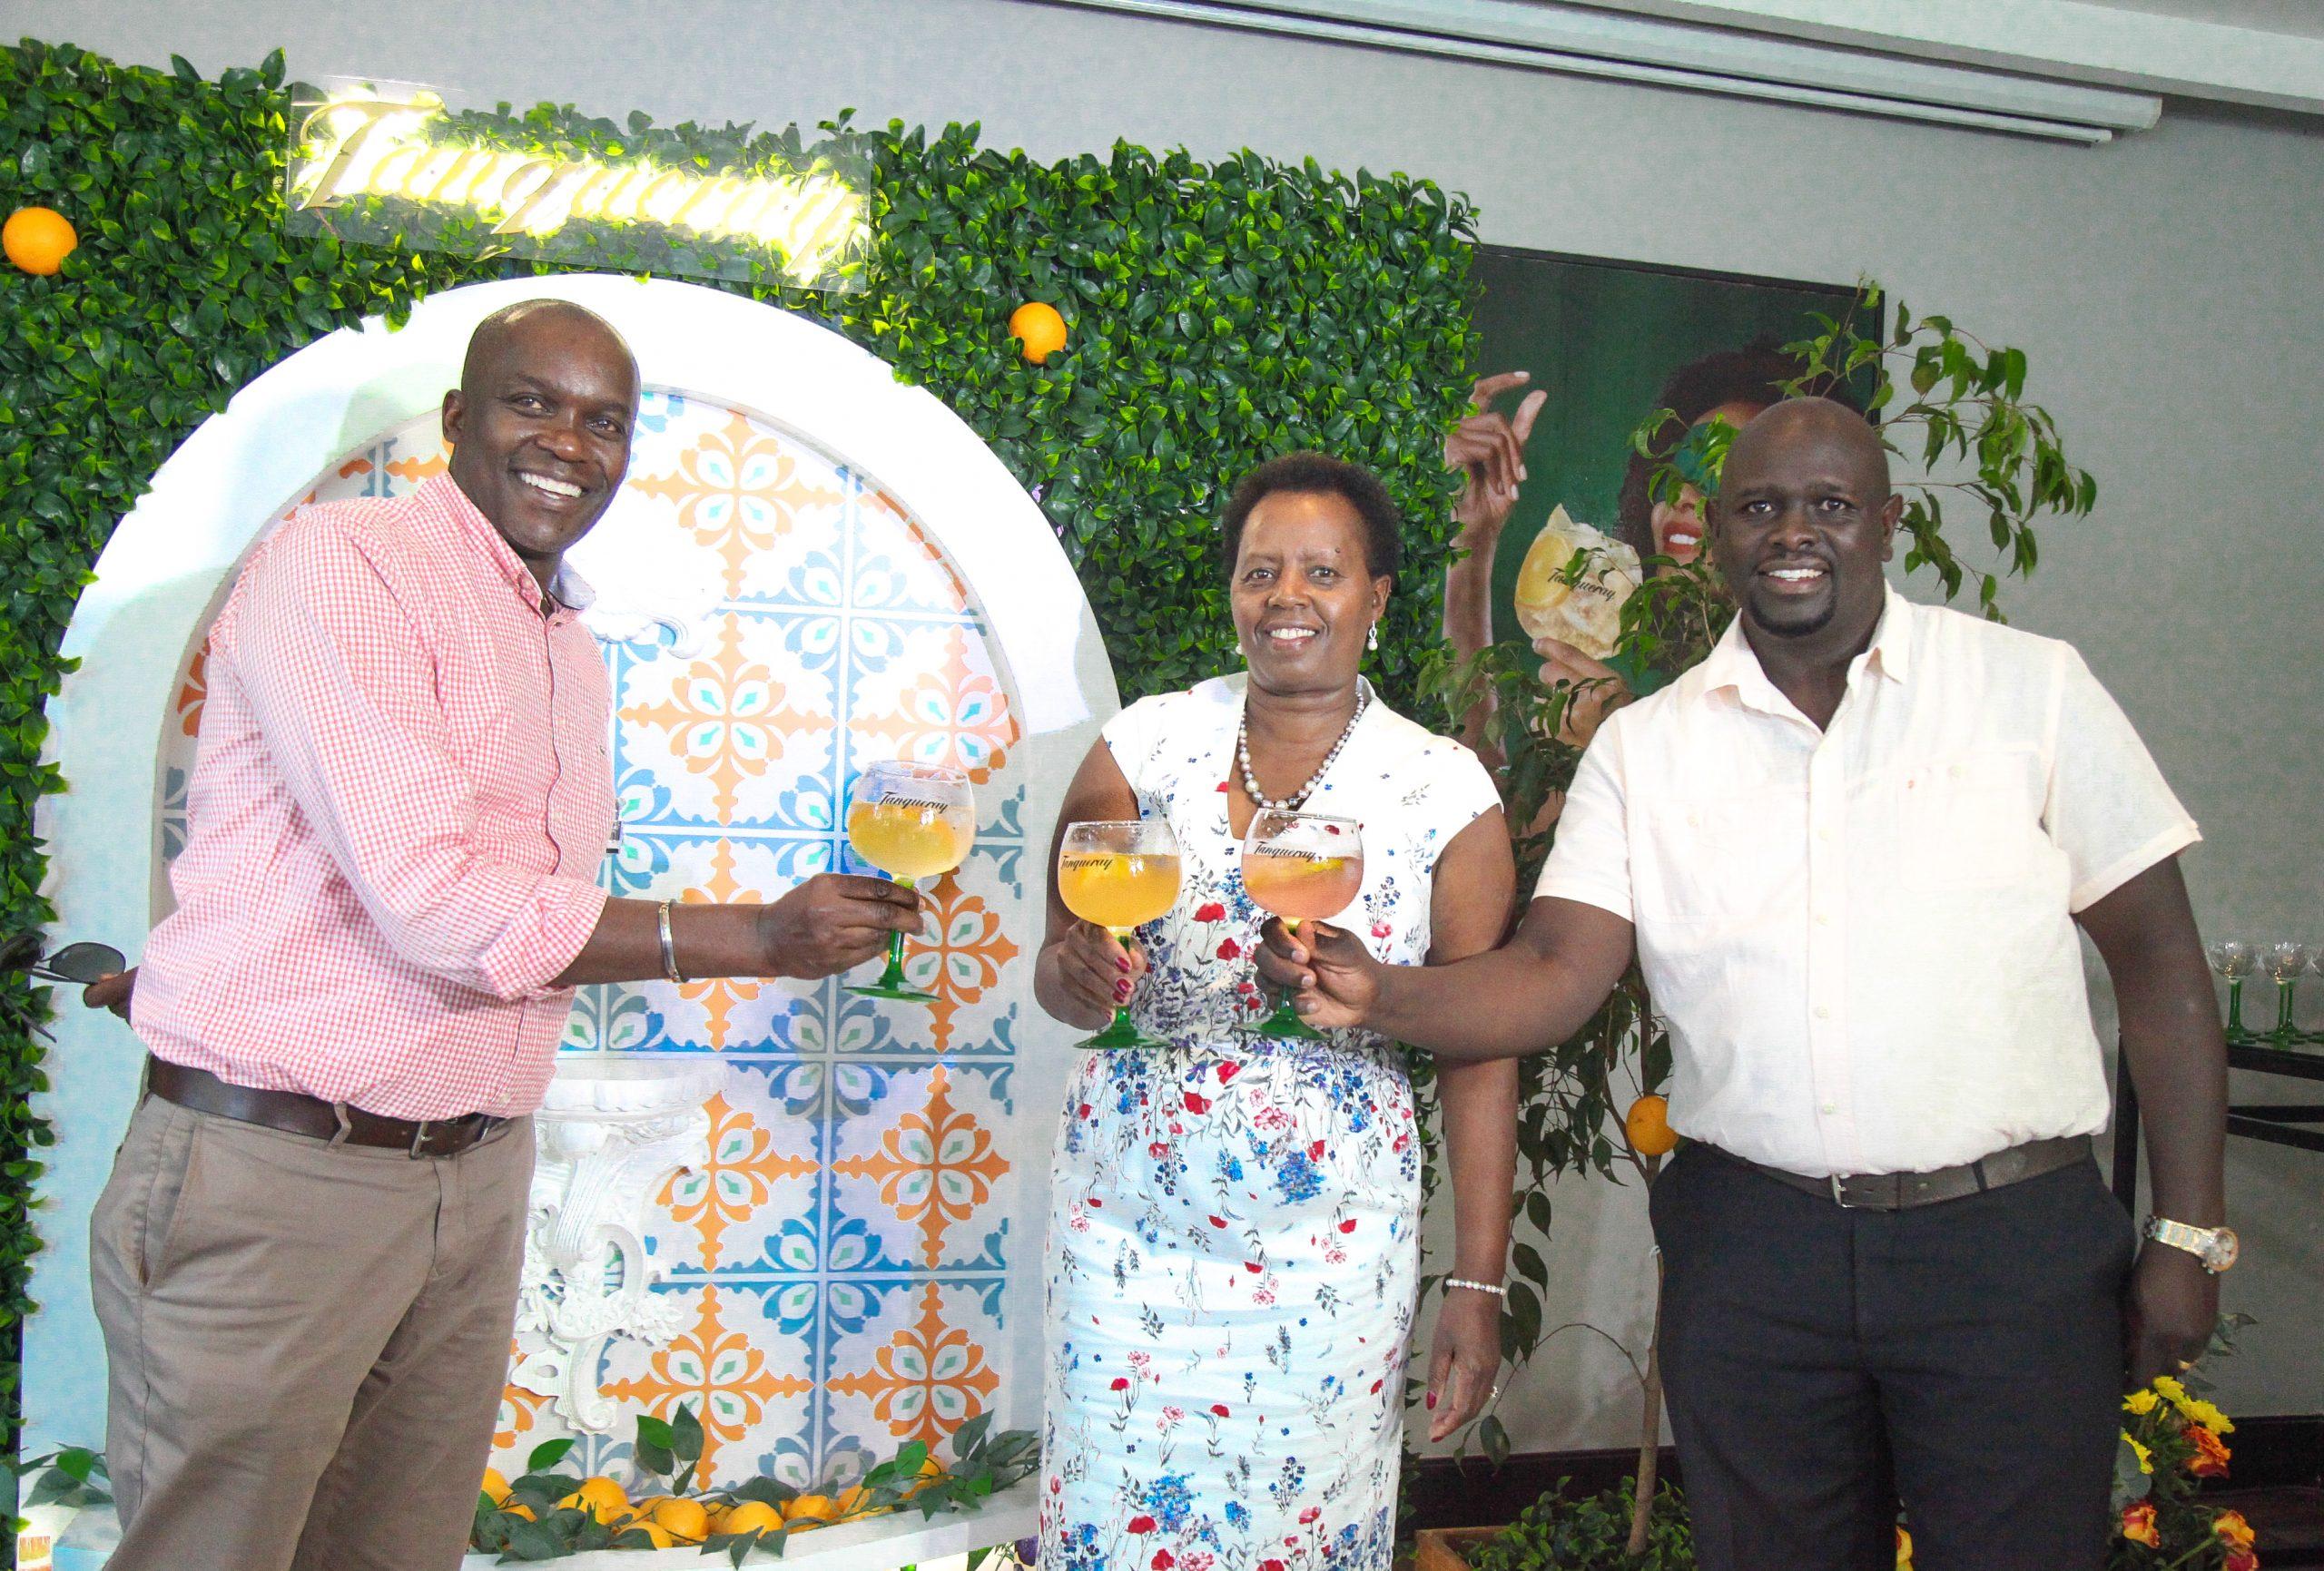 Kbl Officially Launches Tanqueray Flor De Sevilla Gin In Kenya photo